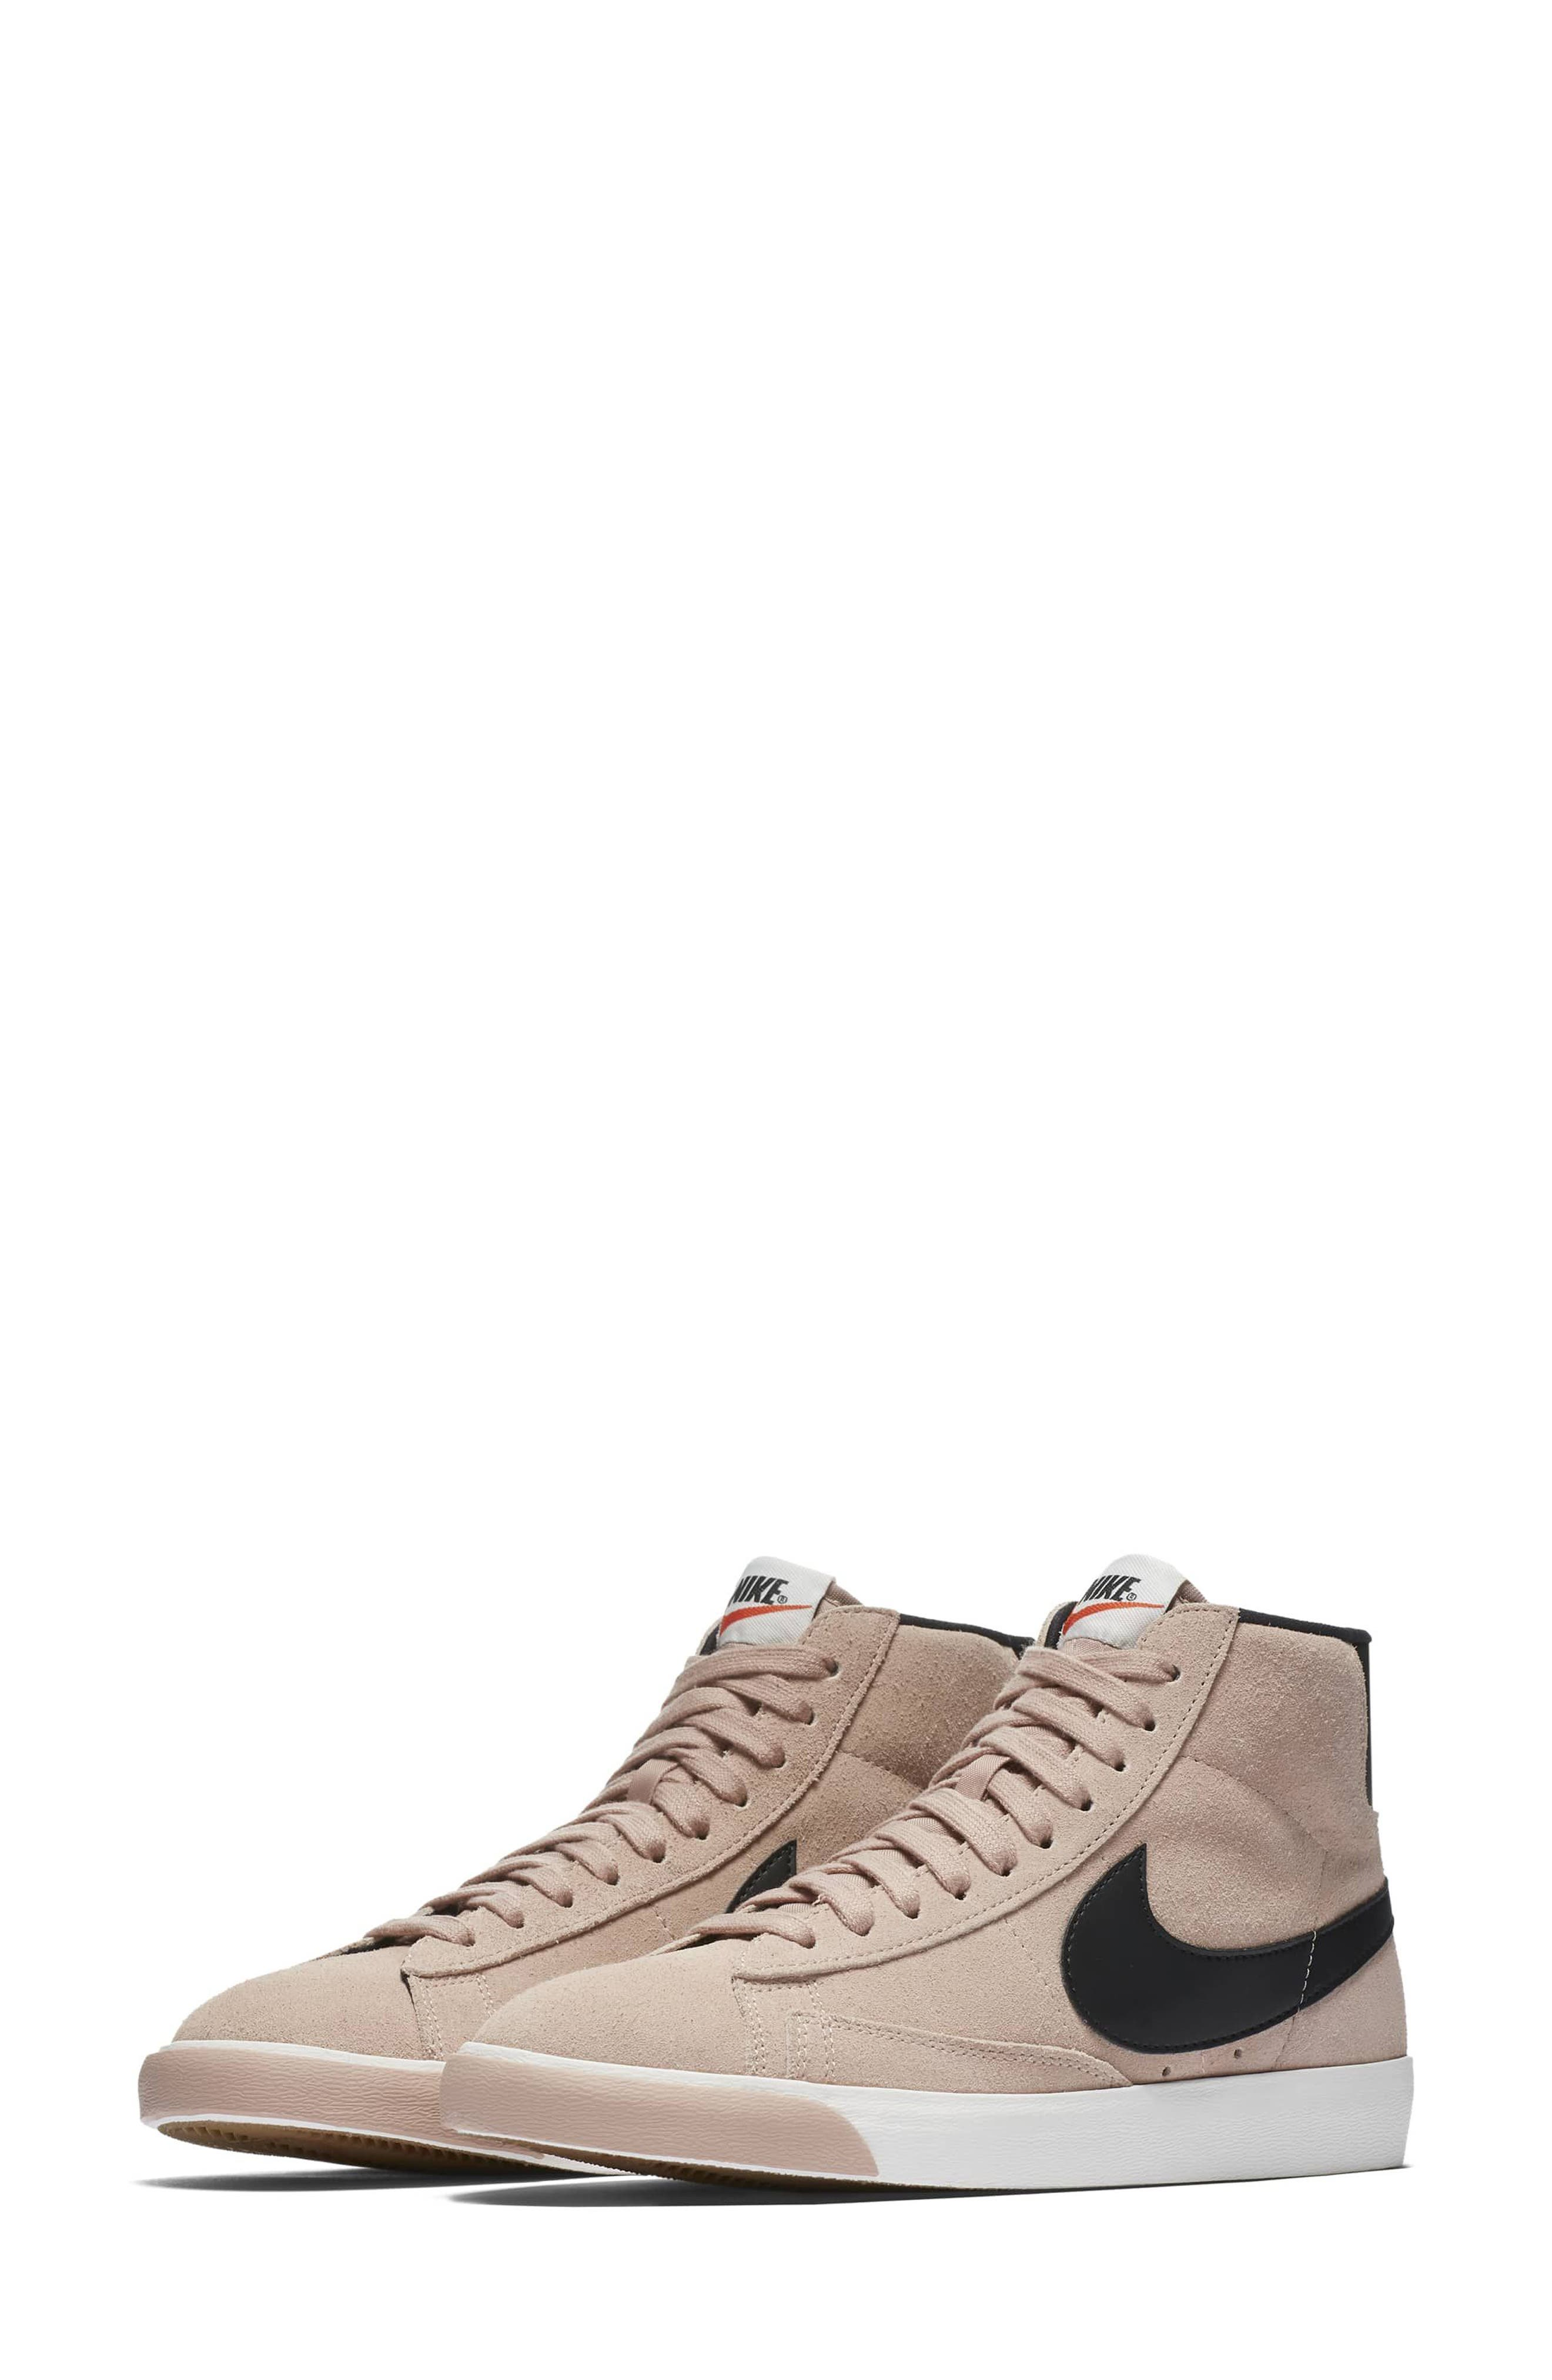 Nike Blazer Mid Vintage Sneakers (Women)